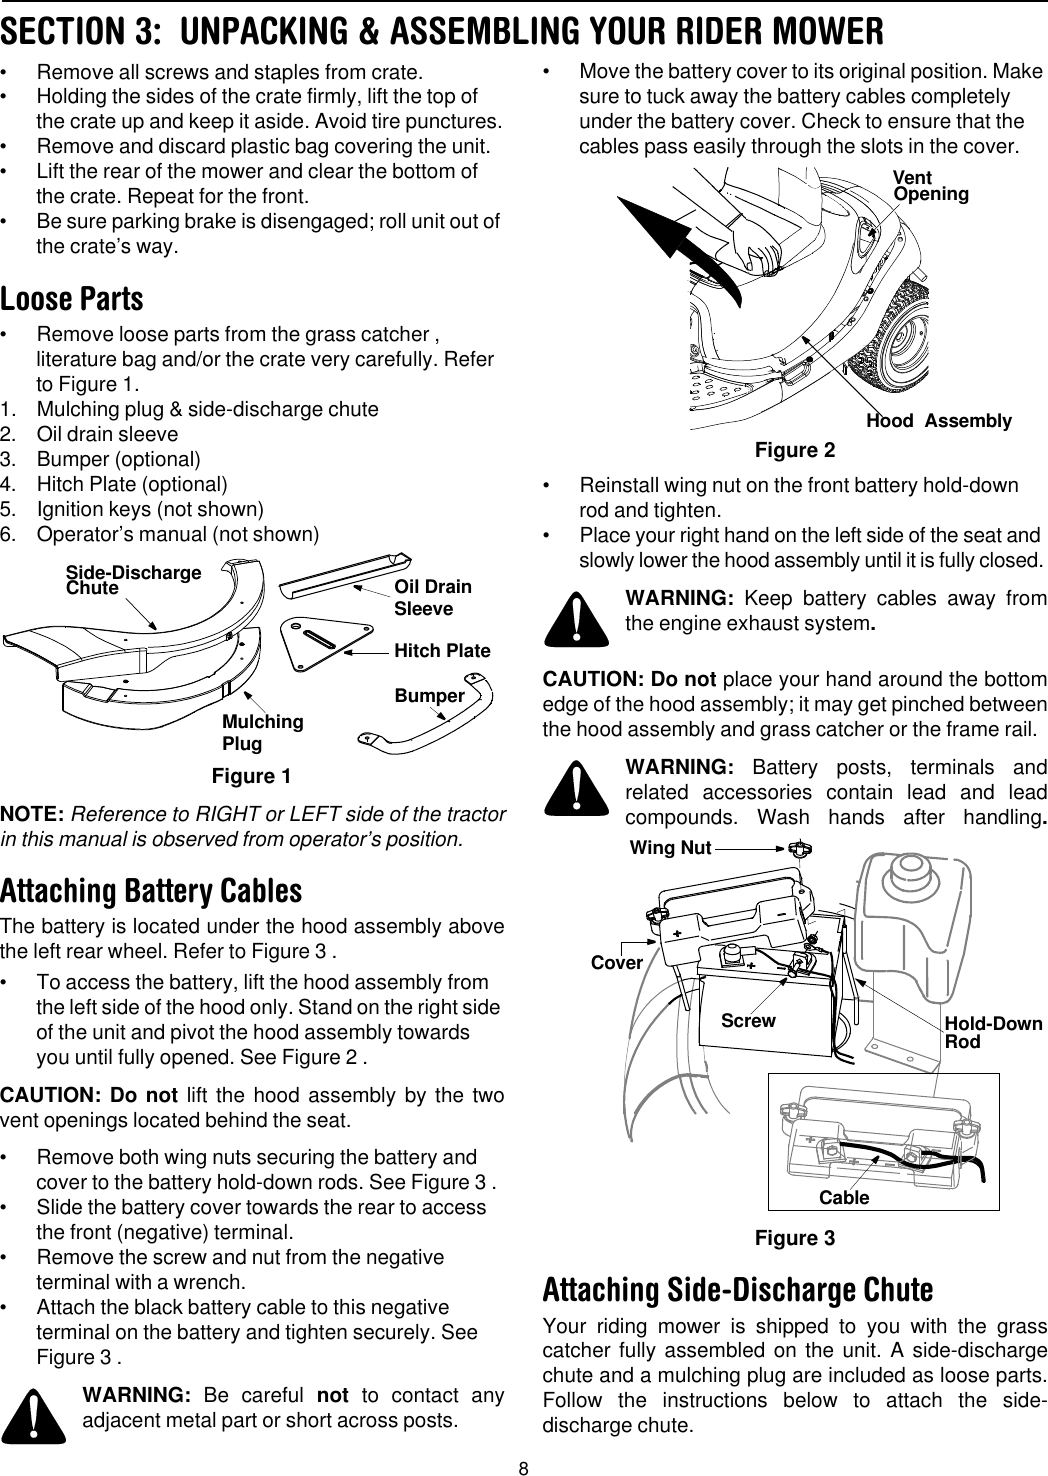 Troy Bilt 13A 344 563 Users Manual Ogrm 5103E(03)